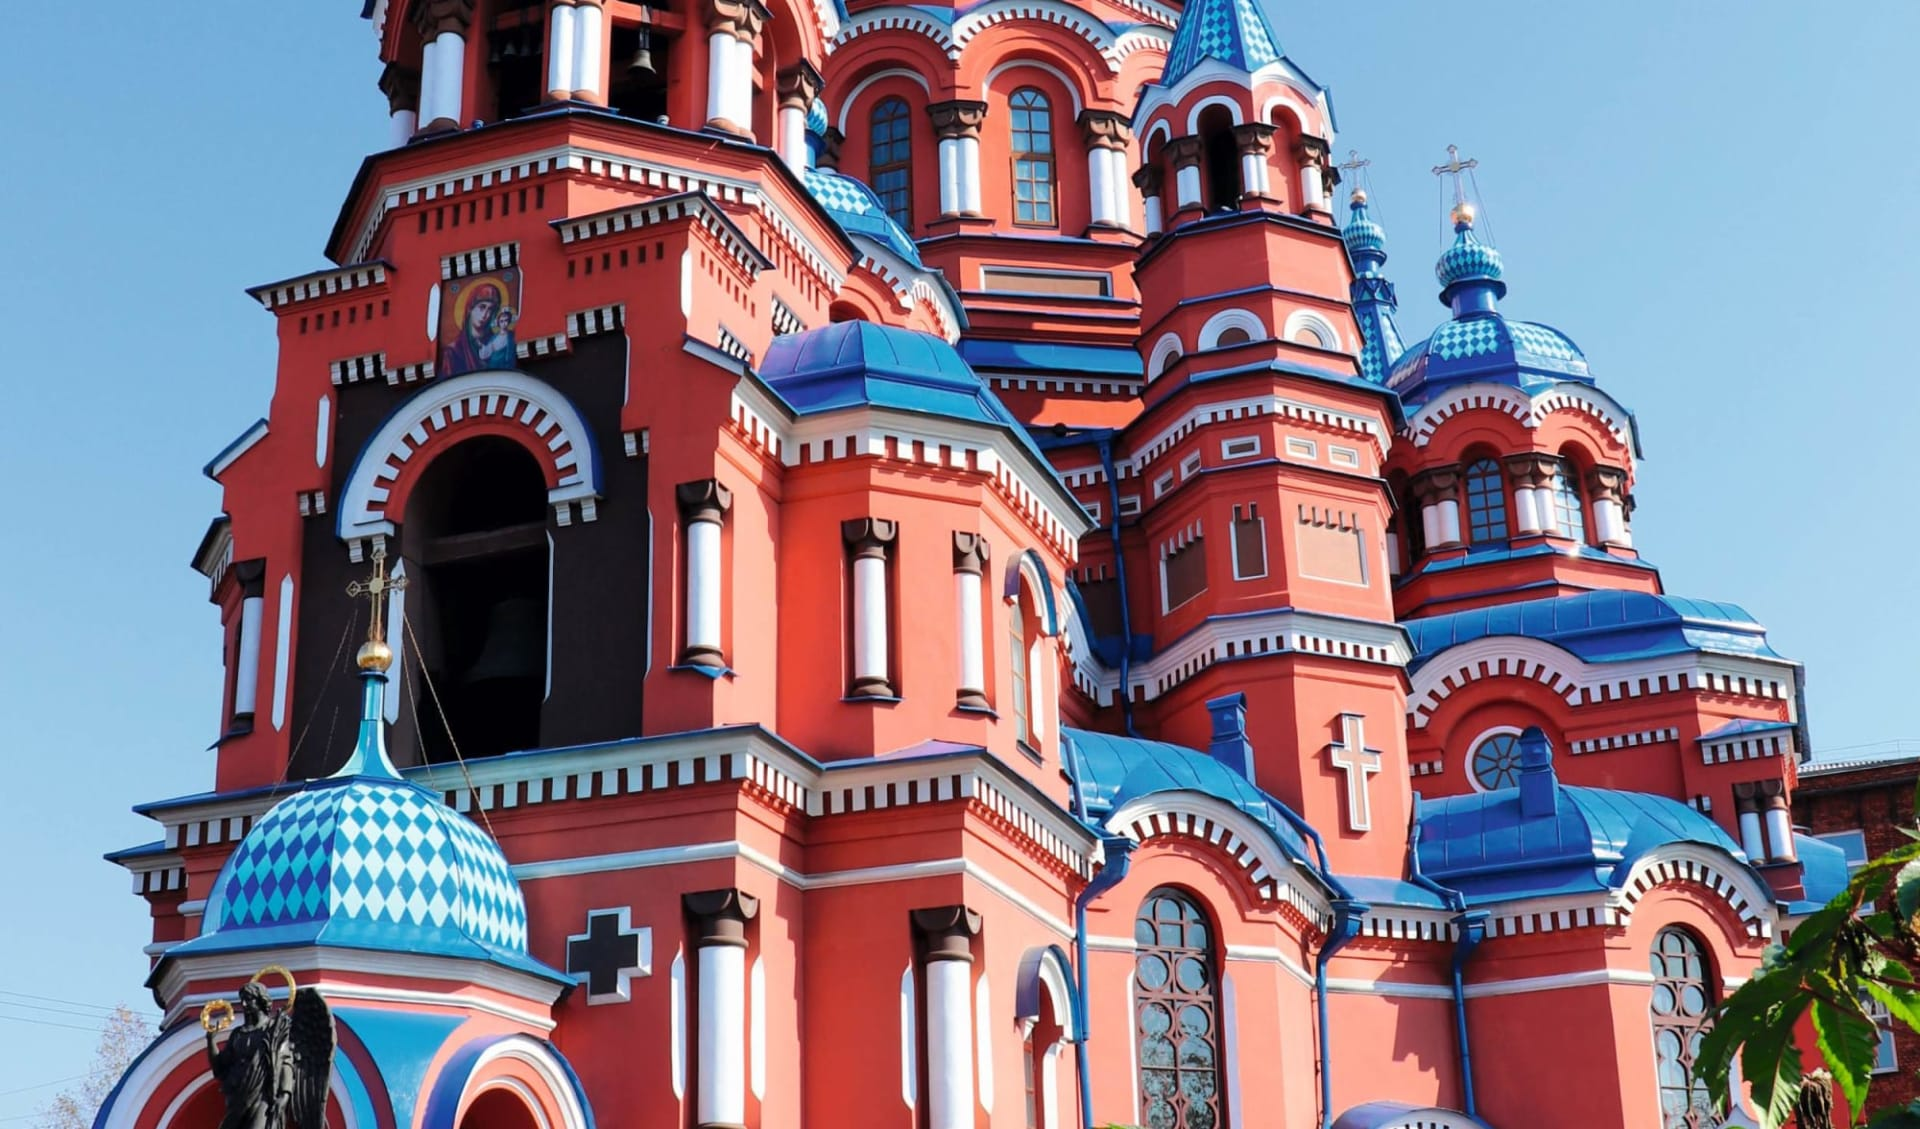 Irkutsk und der Baikalsee: Russland_Irkutsk_KasanerKathedrale_